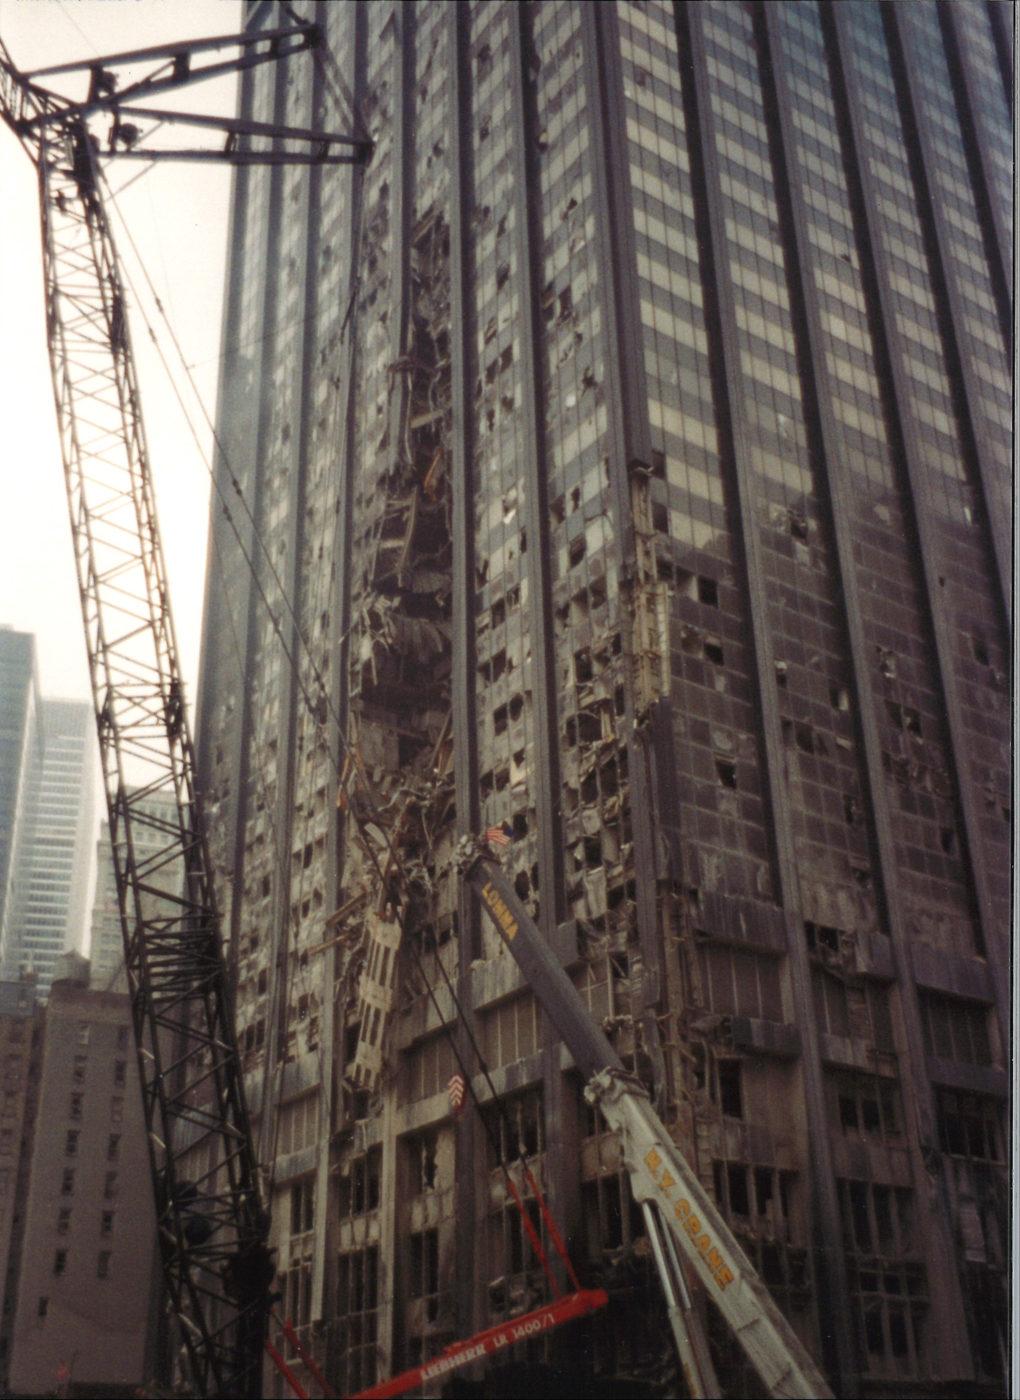 Windows of Deutsche Bank Building Blown Out